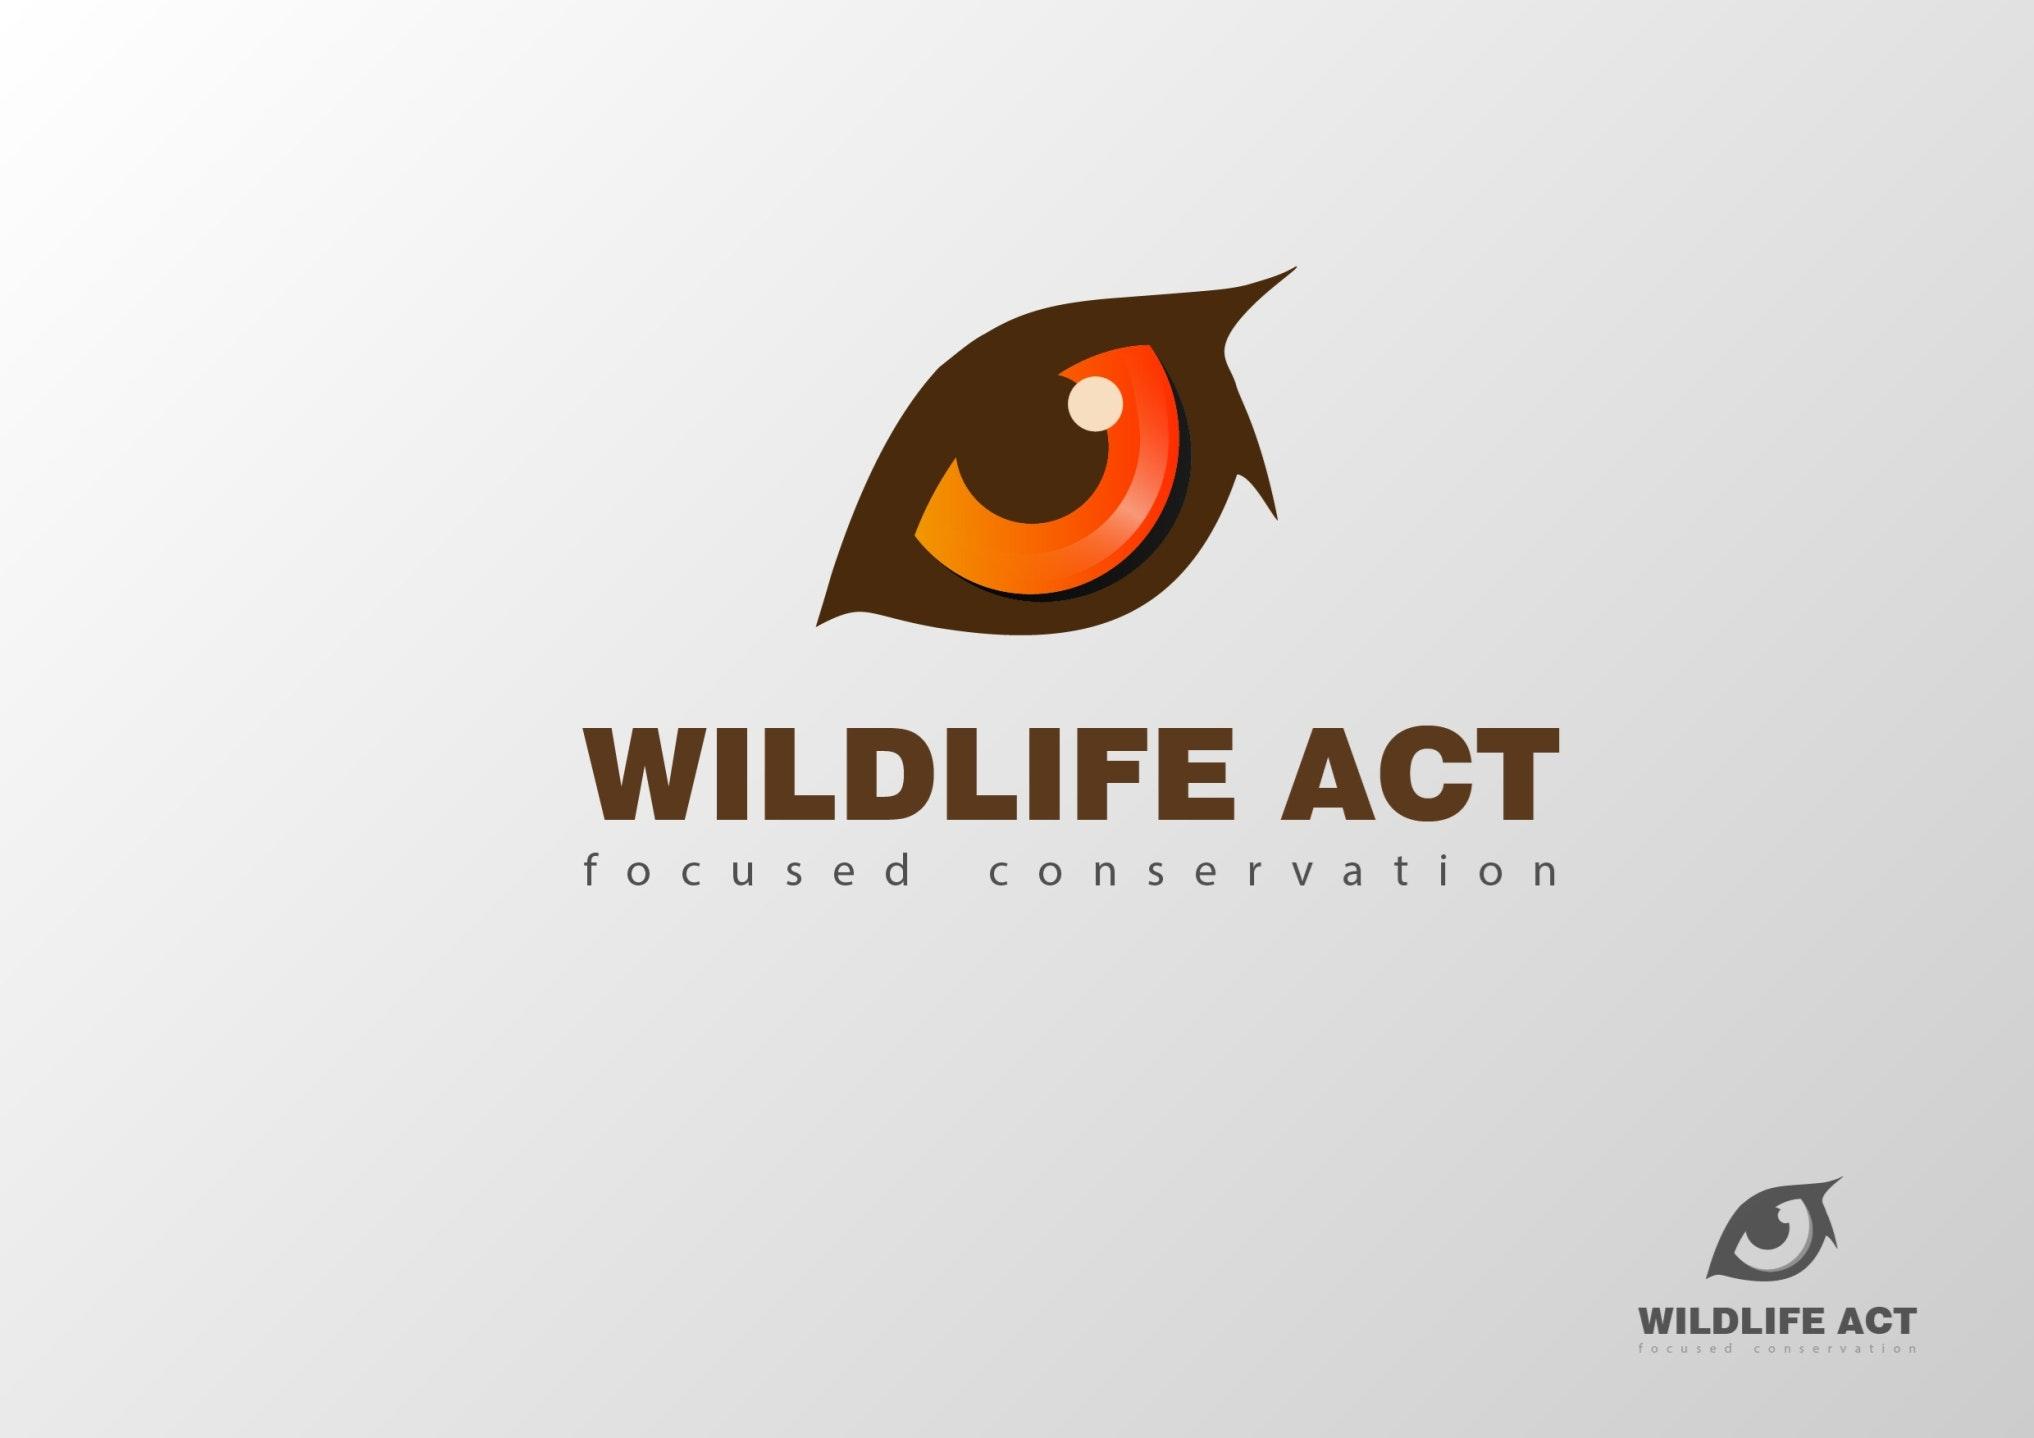 Wildlife Act eye logo